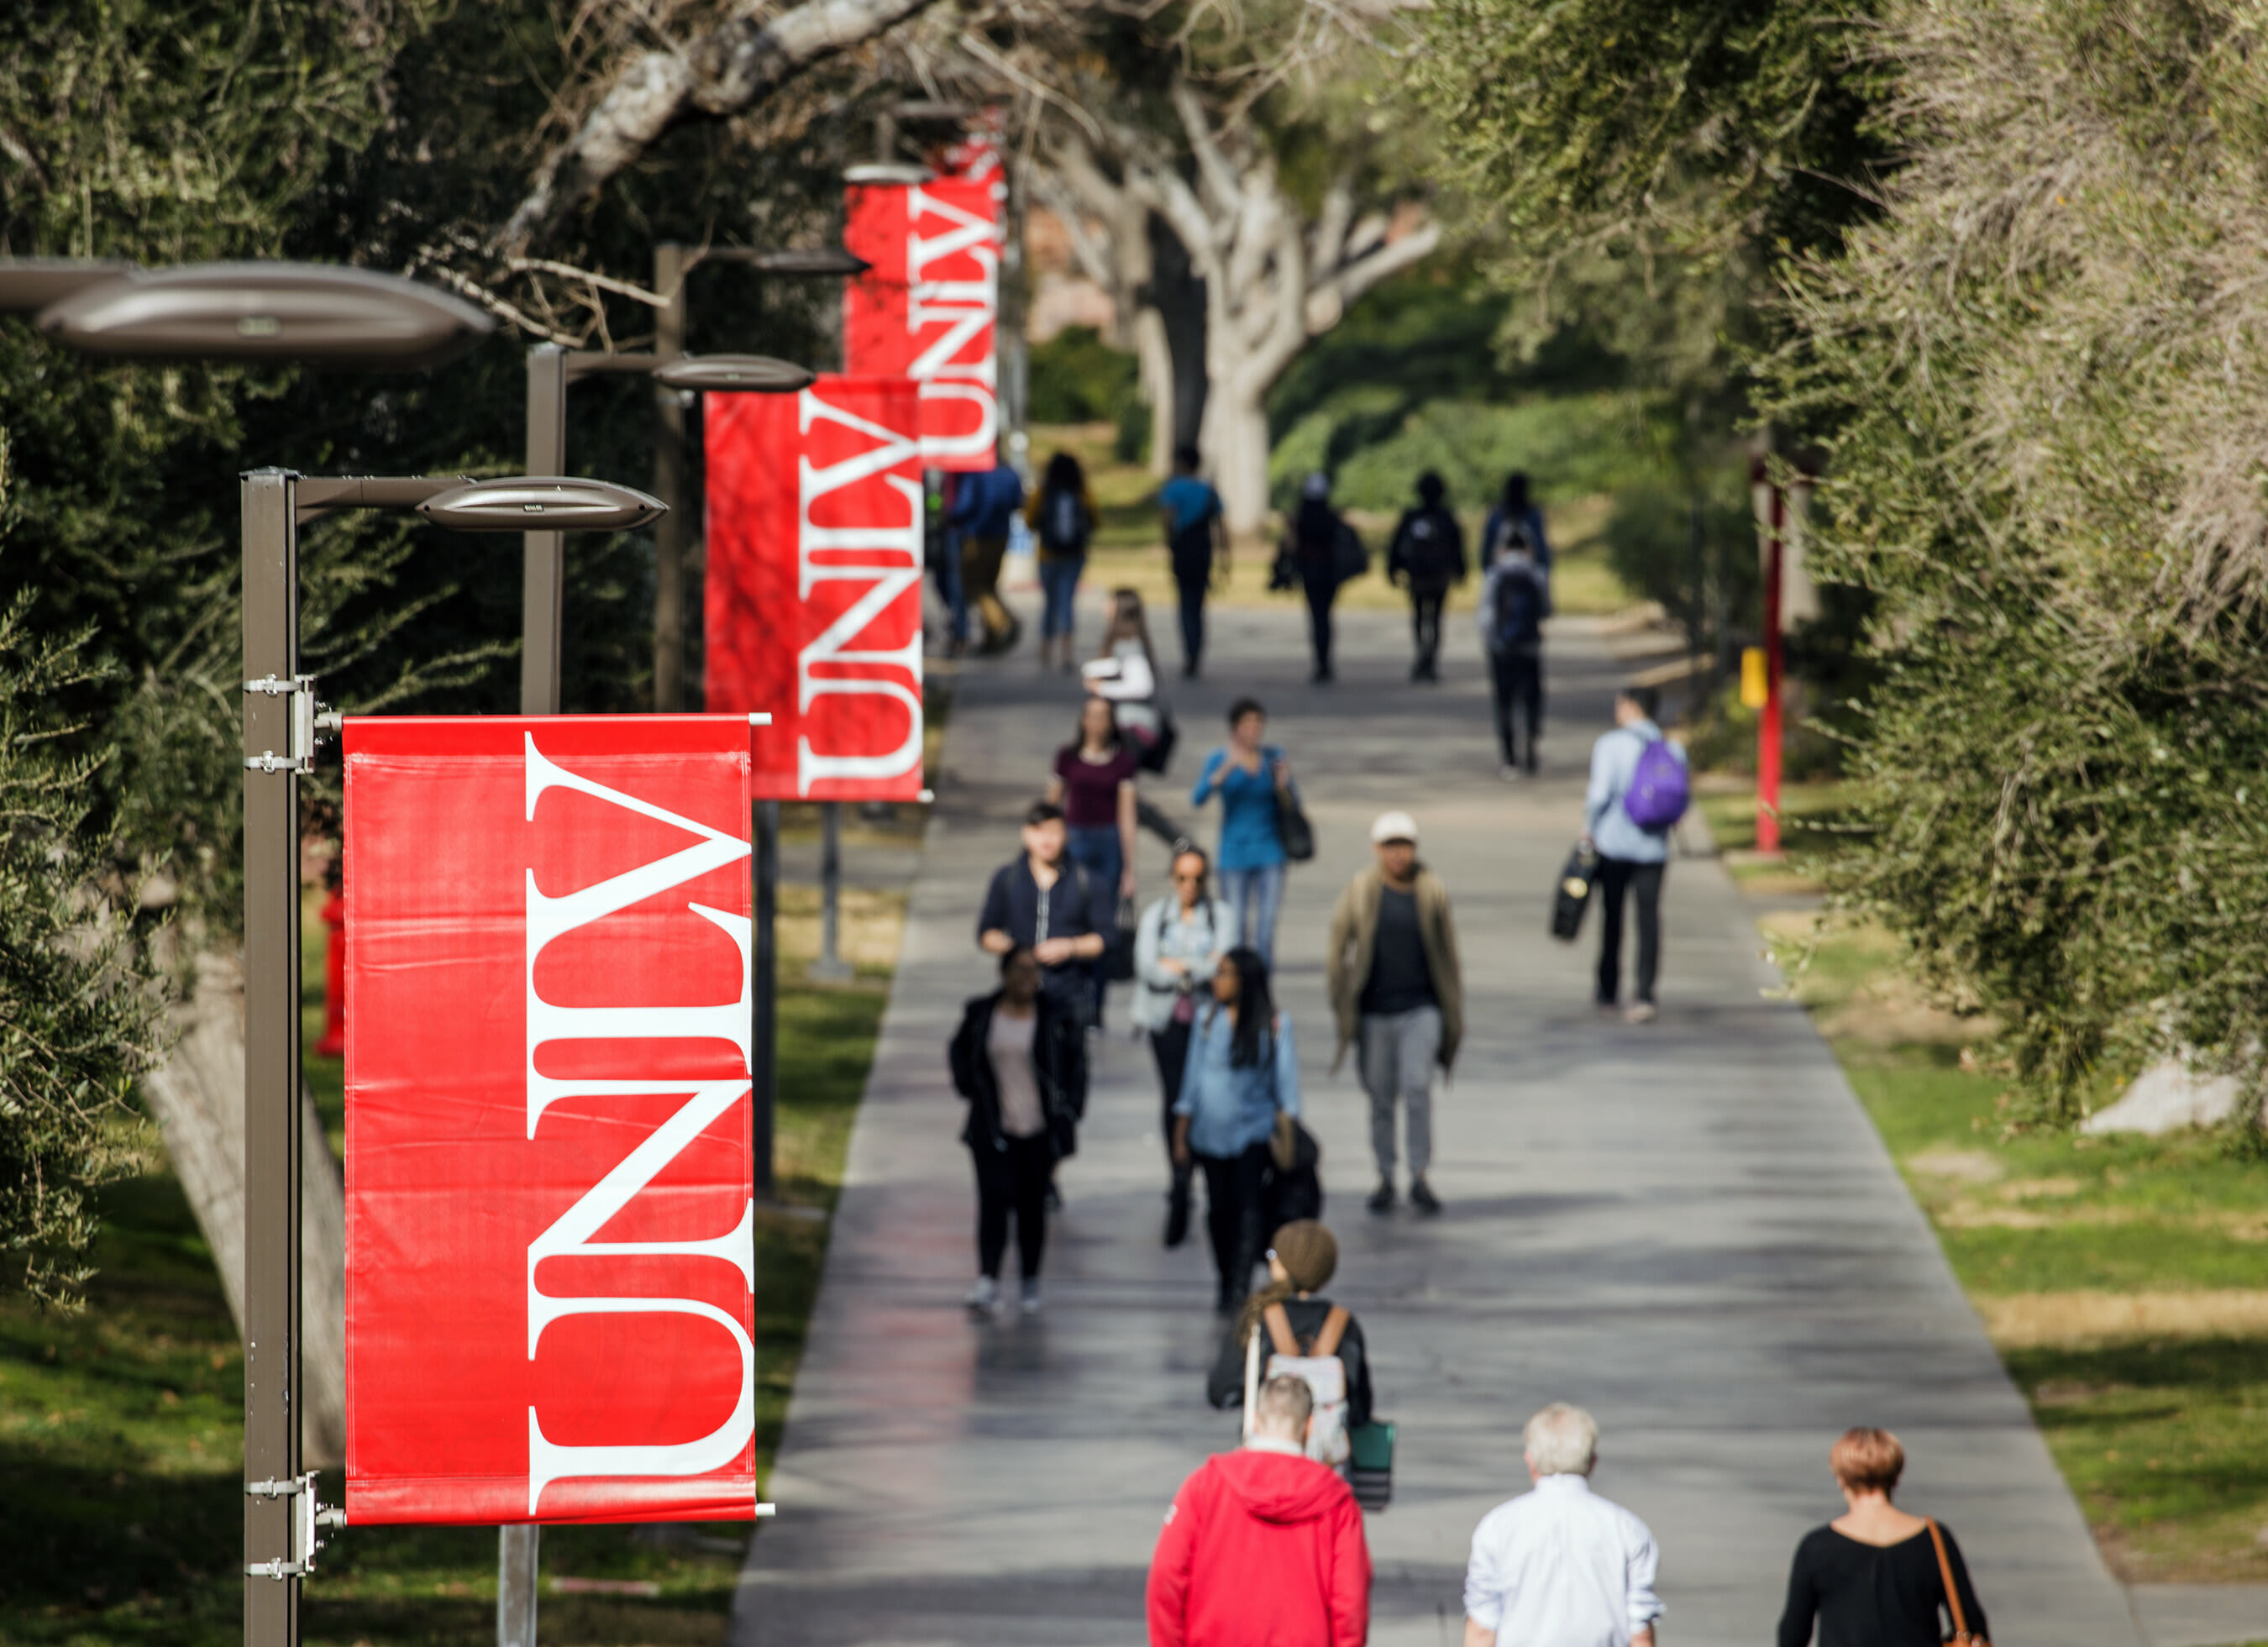 People walk the UNLV campus